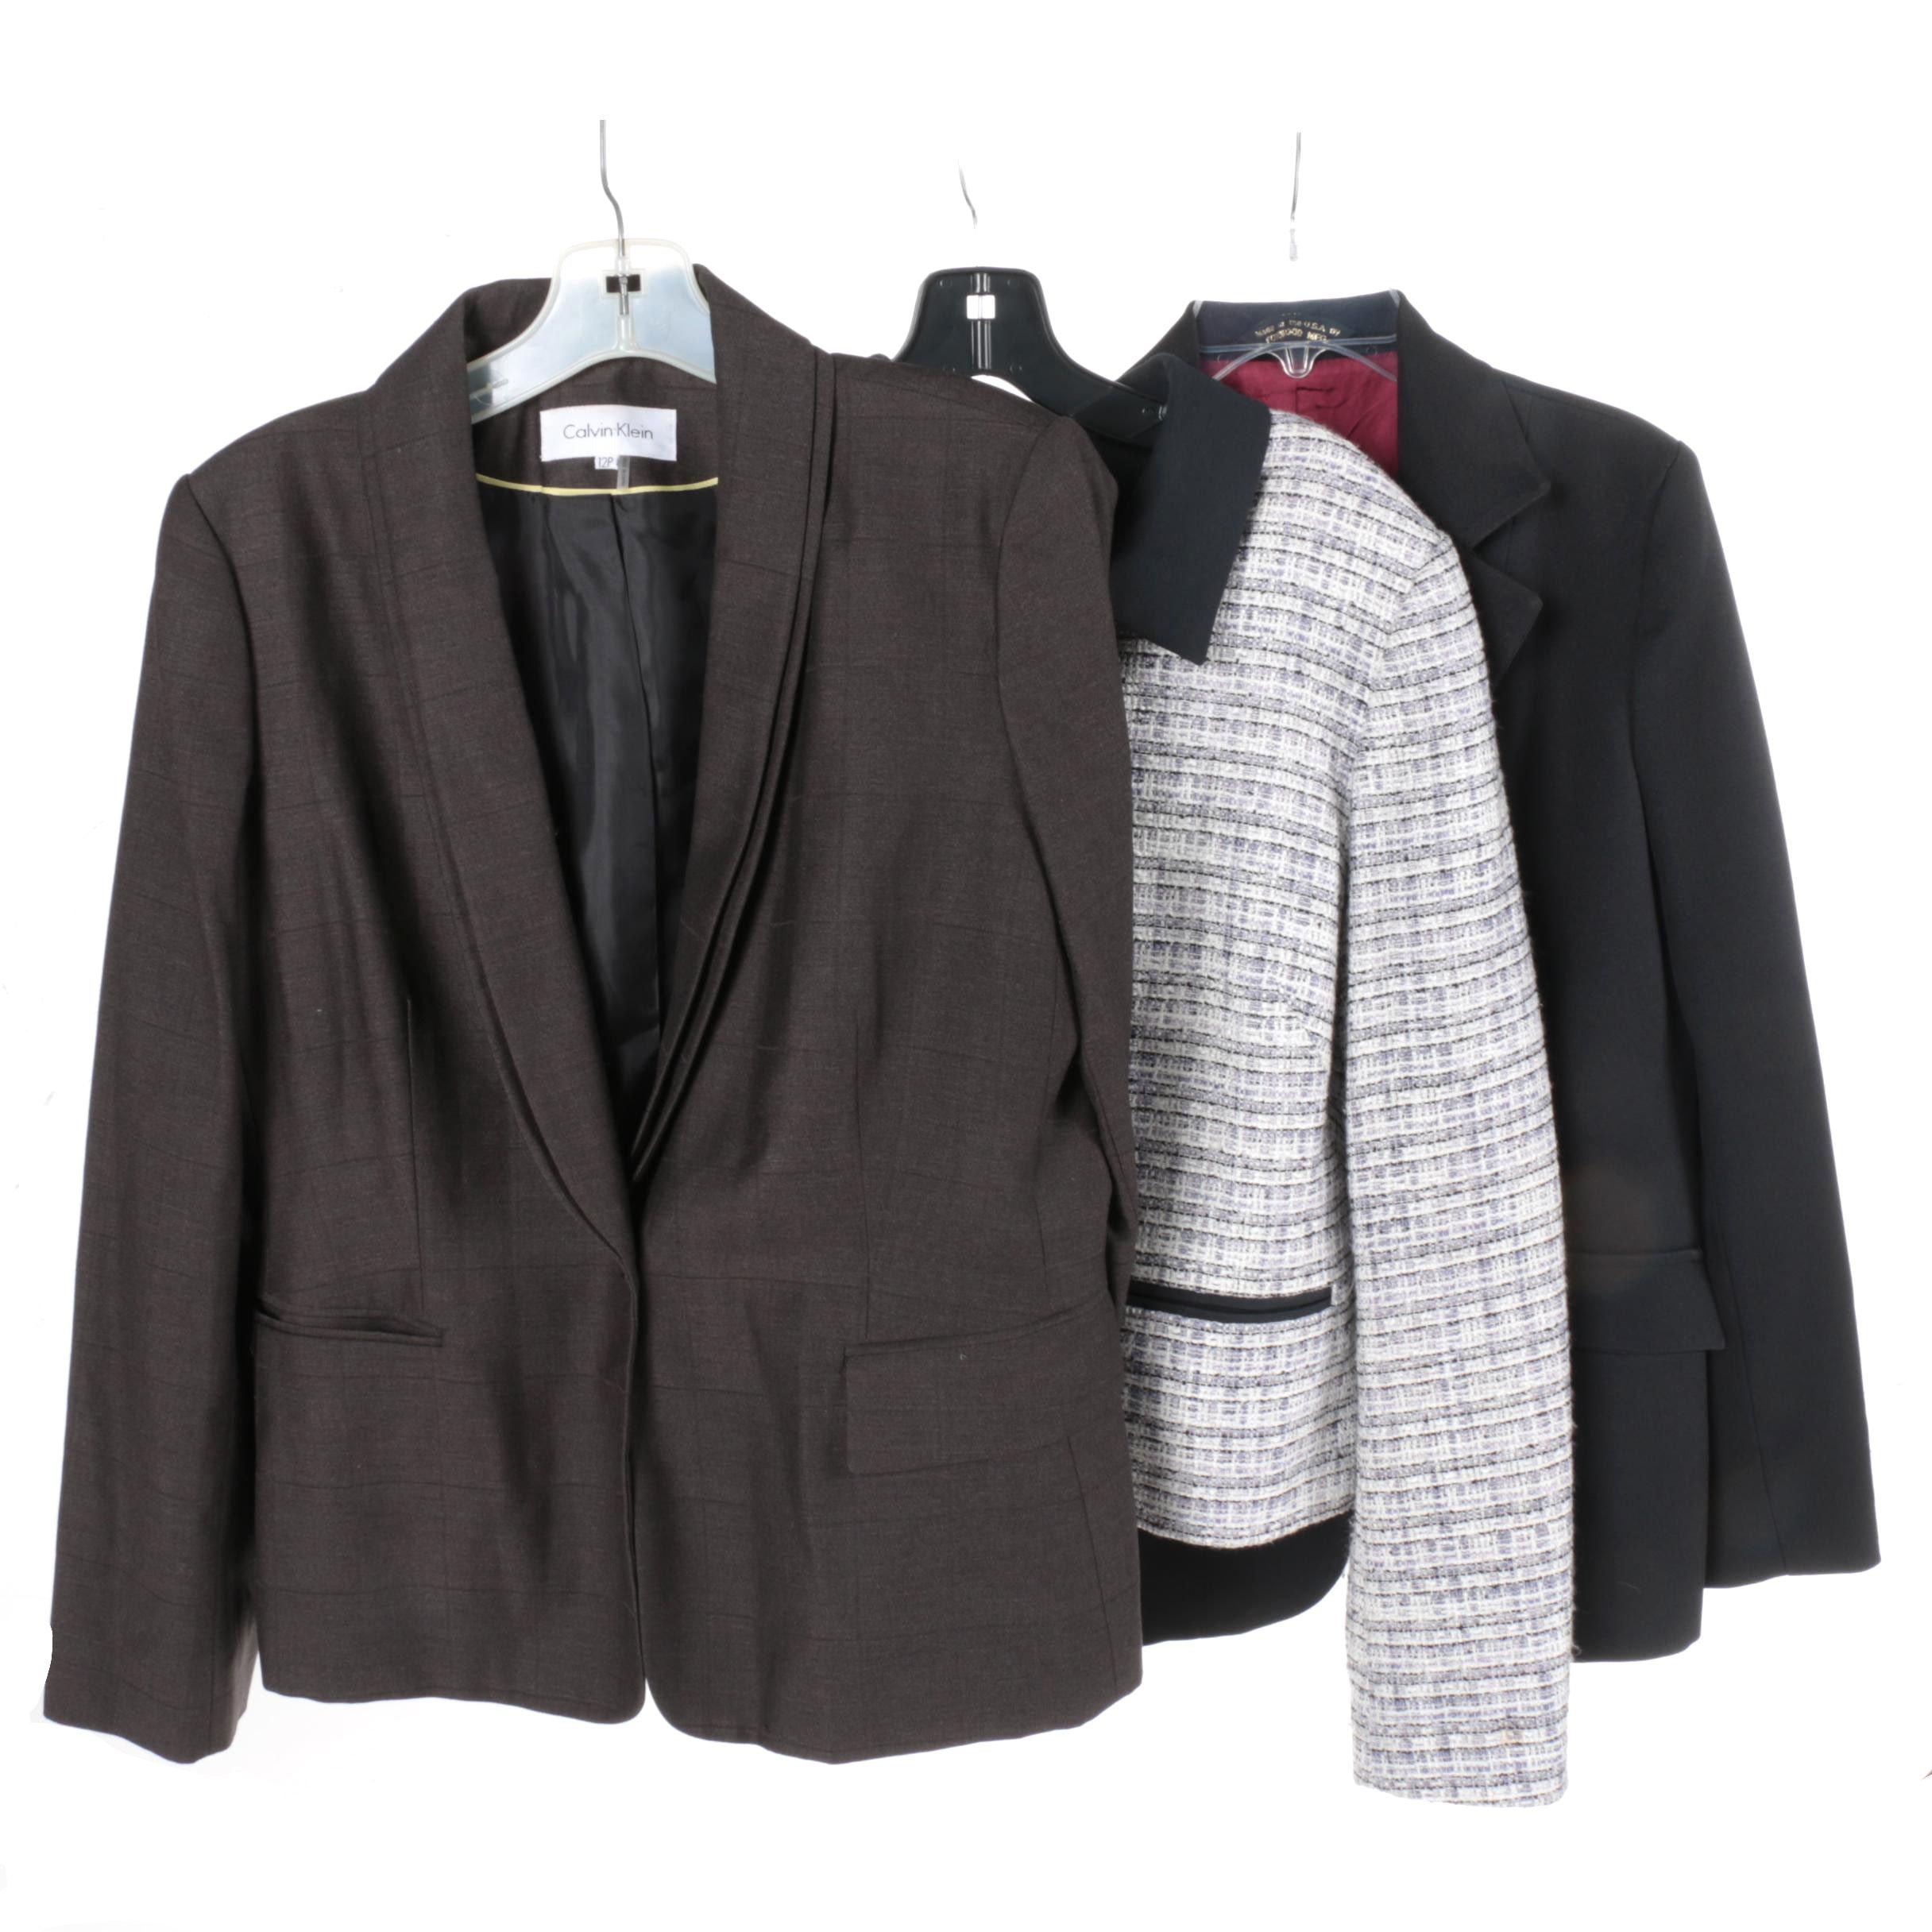 Women's Suit Jackets Including Calvin Klein